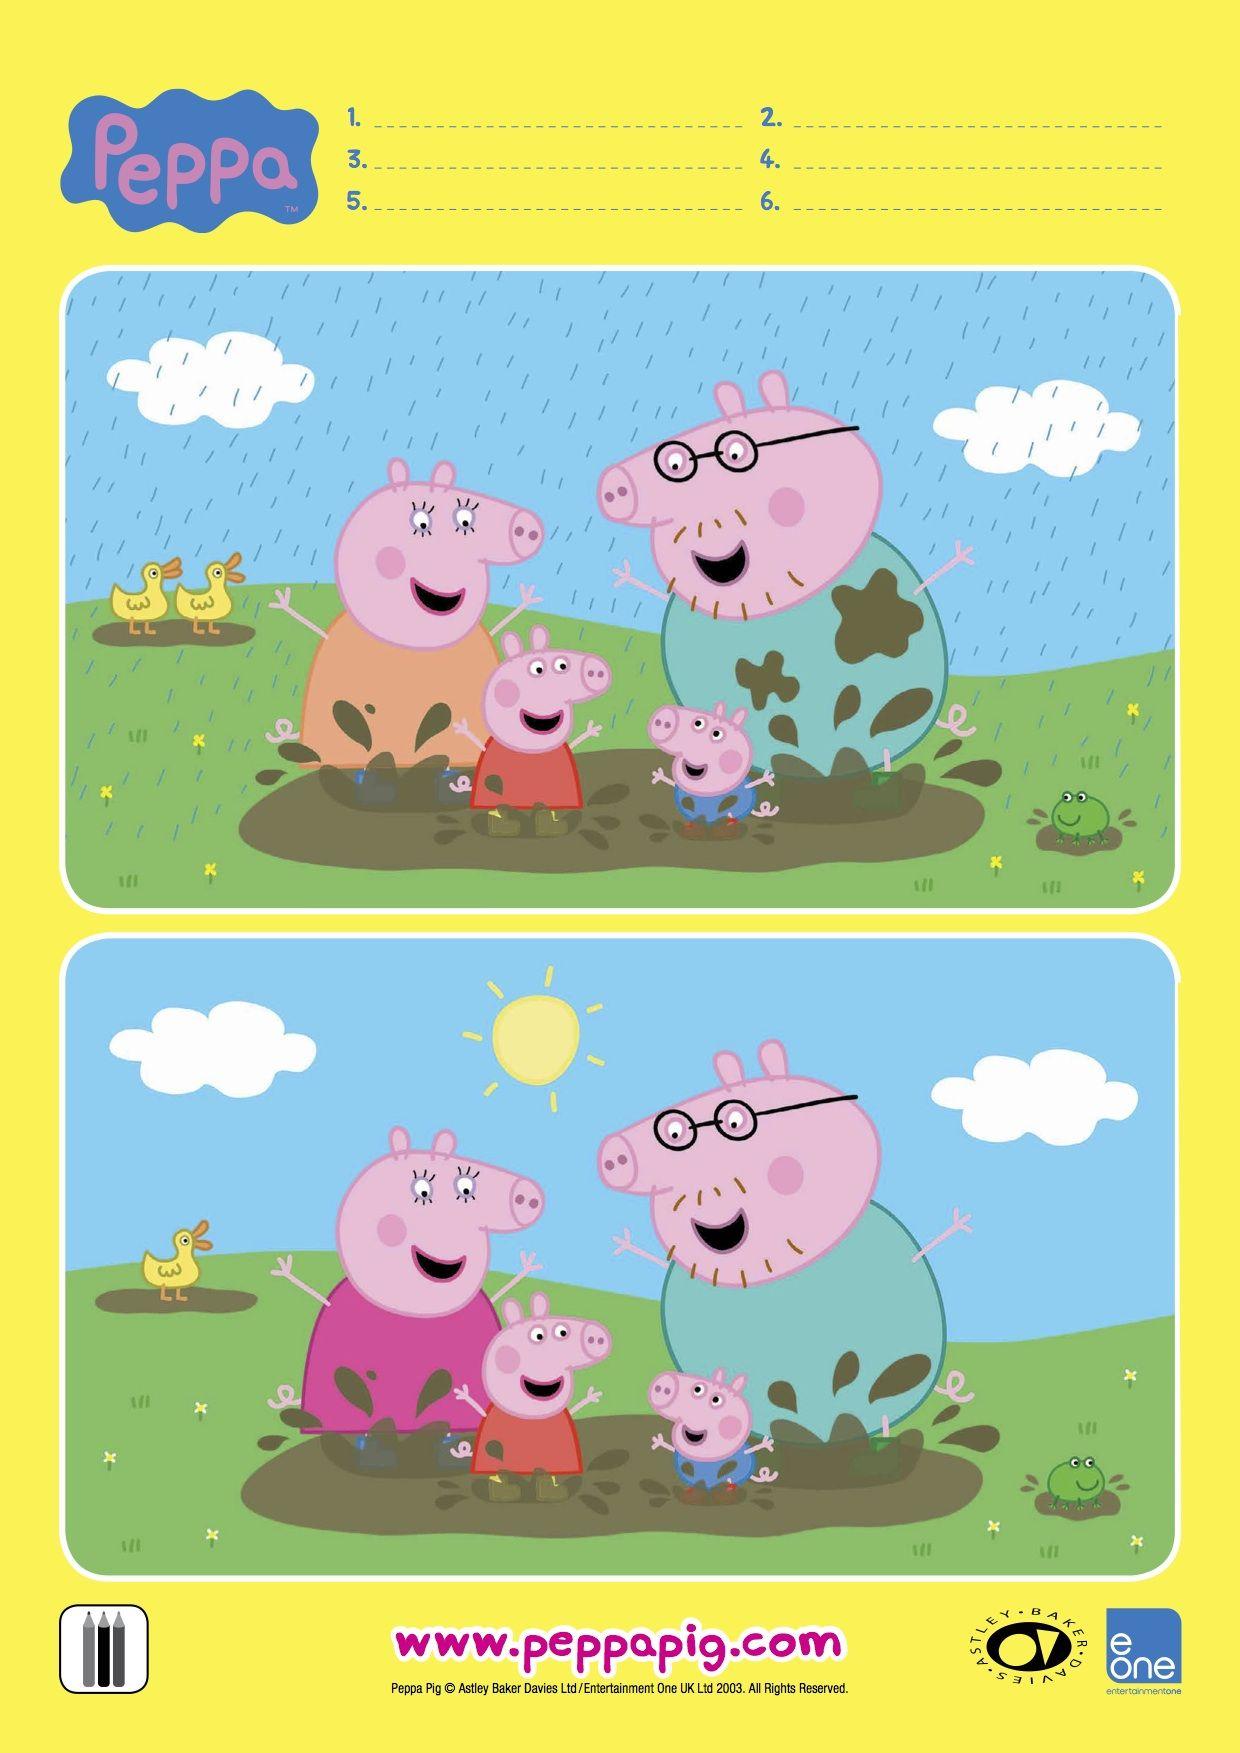 Epingle Par Gris Villarroel Sur Peppa Pig